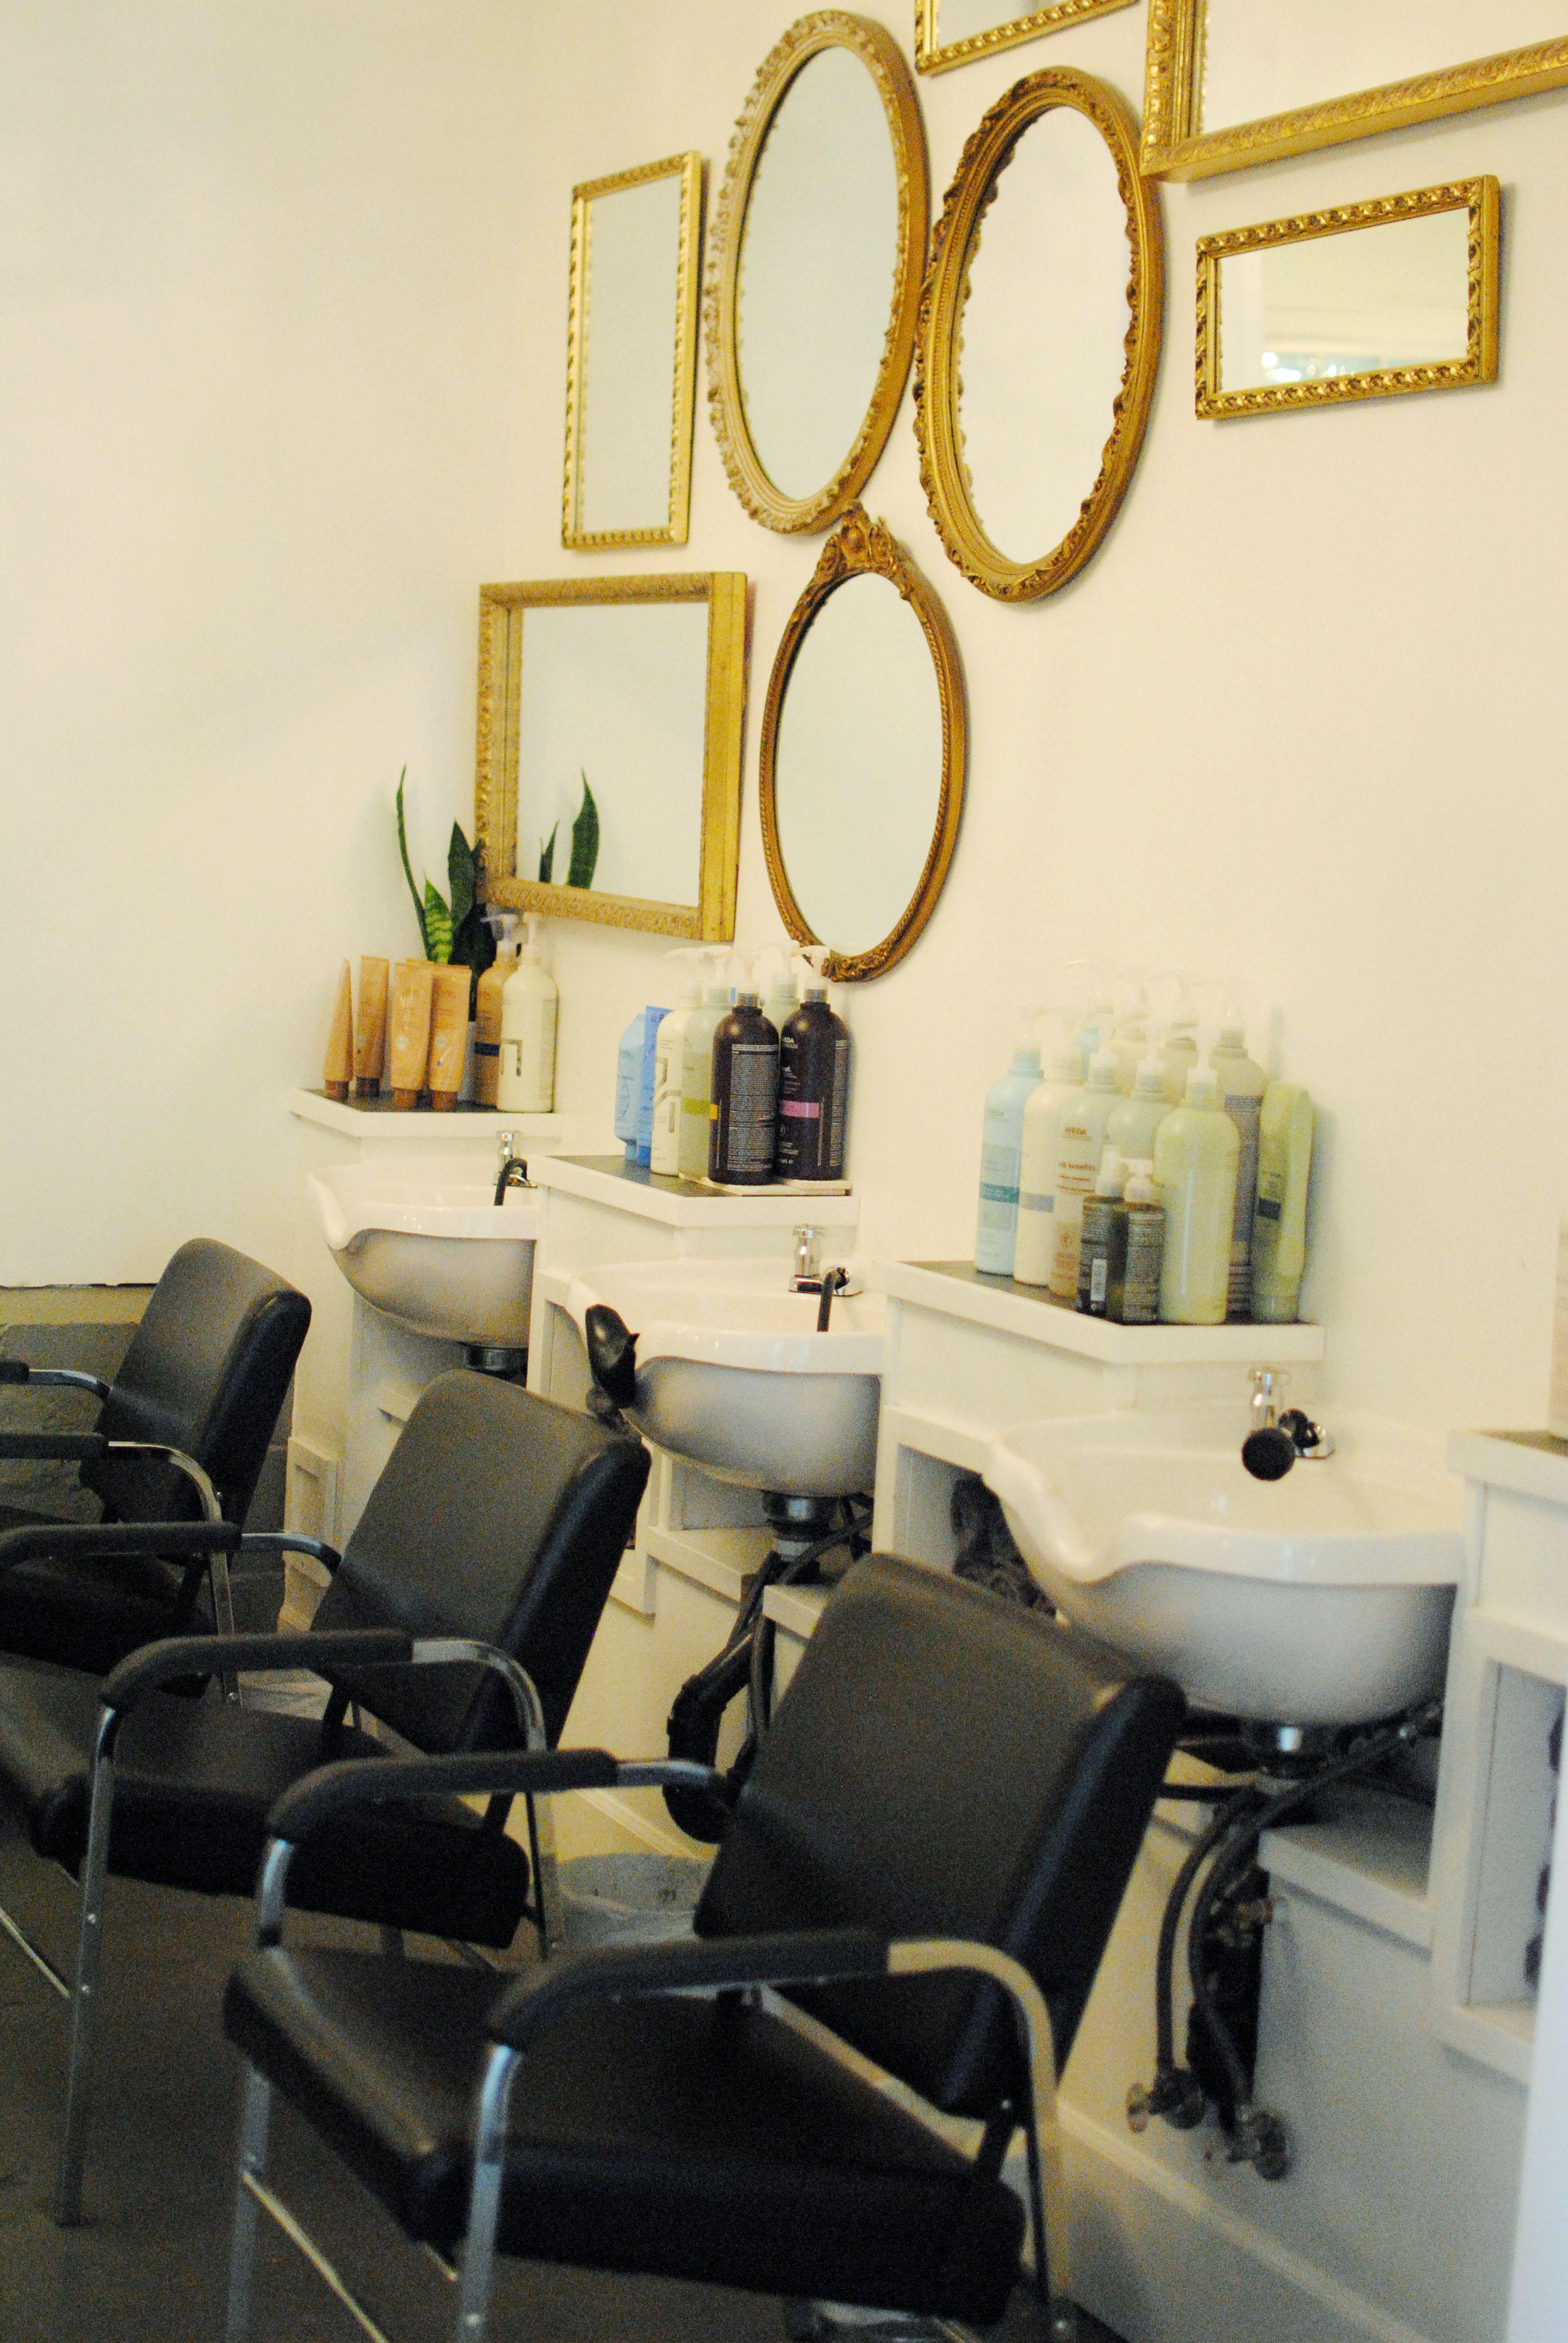 Trim Hair Salon Interiordecor Chaise Shampooing Jetco Lavabo